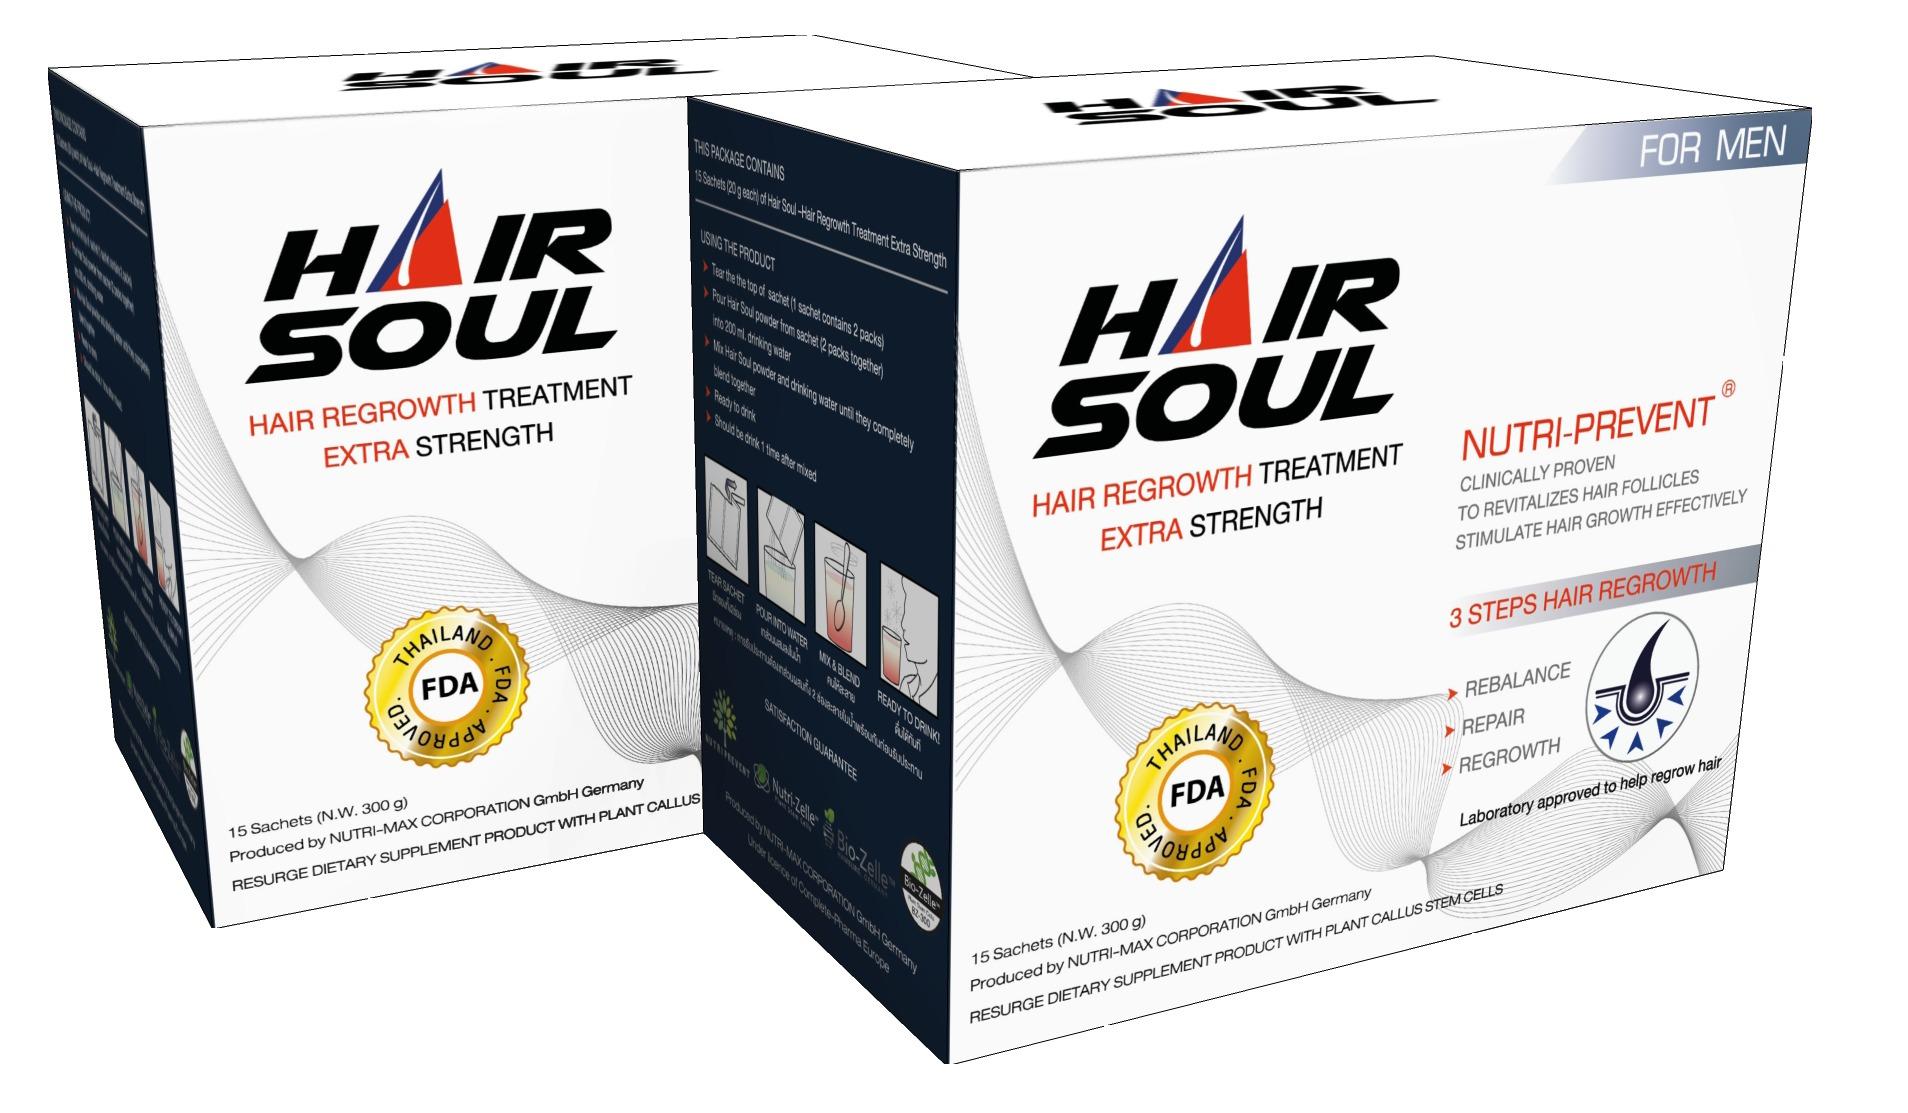 http://www.naadeng.com/hair-transplant-pills-serum/